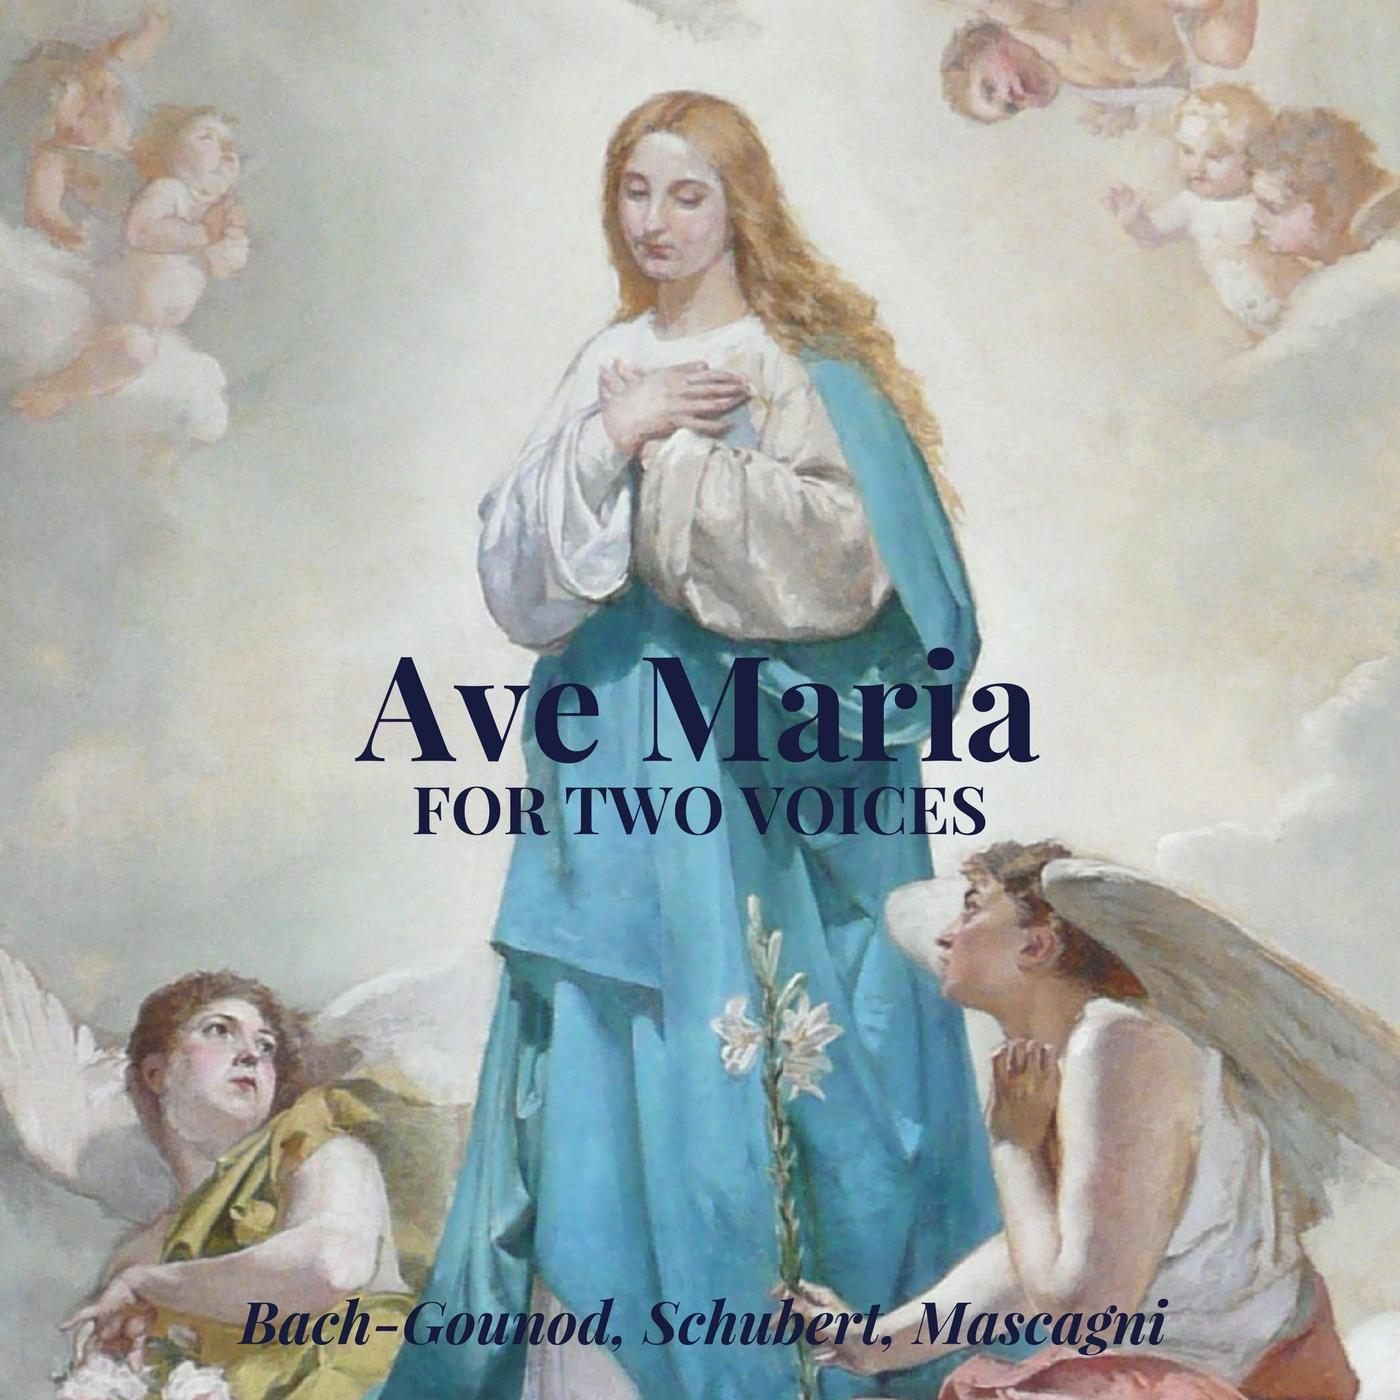 Ave Maria [per due voci] (Bach-Gounod, Schubert, Mascagni) | Musica Sacra Natalizia